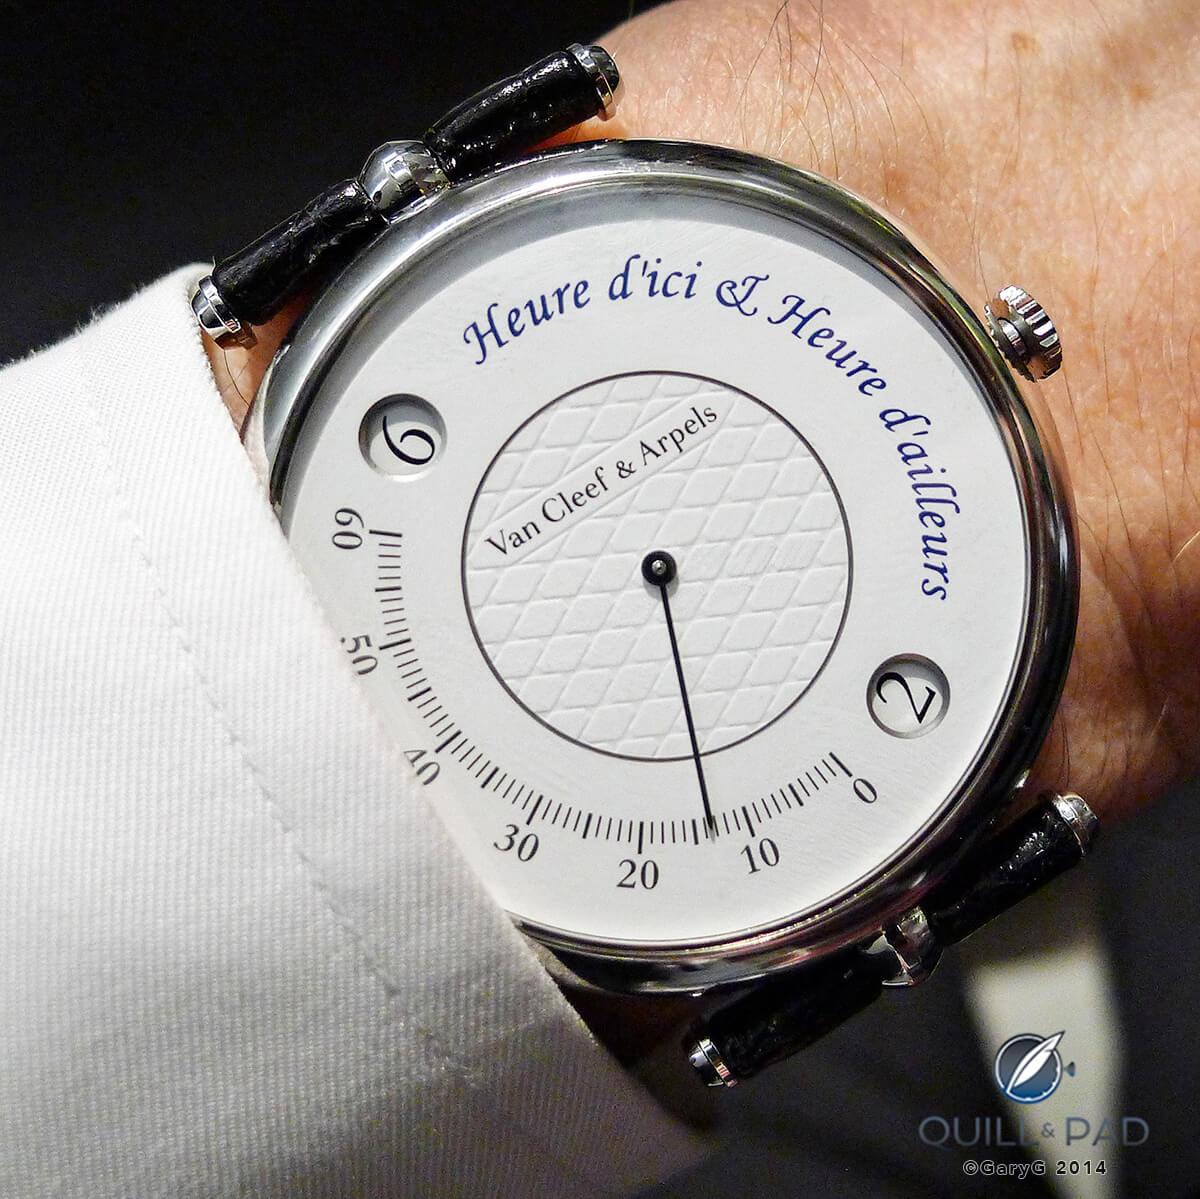 Van Cleef & Arpels Heure d'ici & Heure d'ailleurs on the wrist